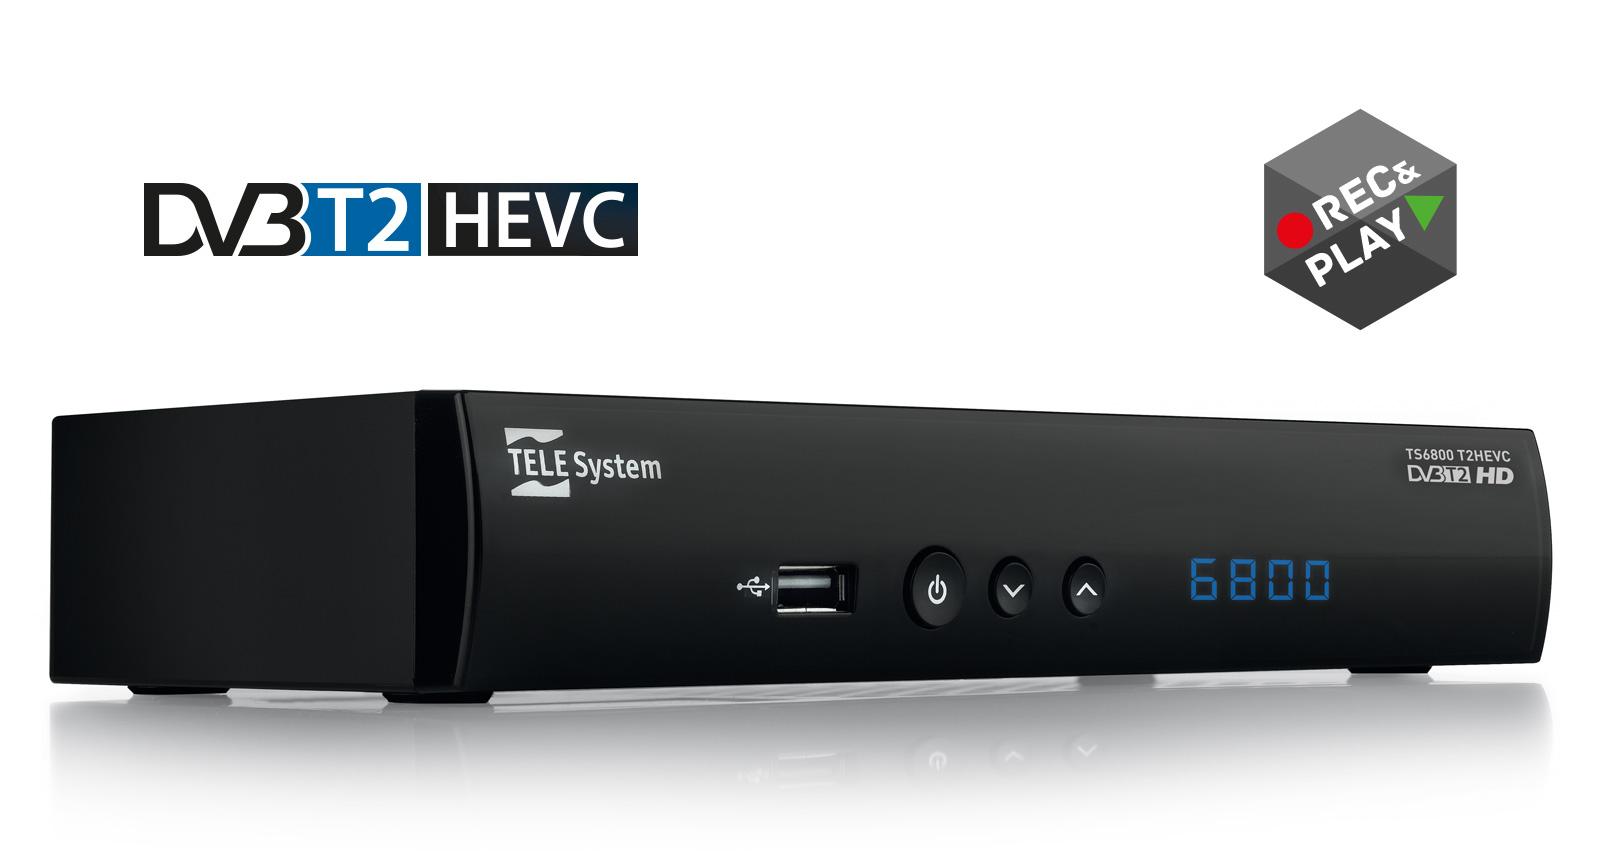 Ricevitore digitale TS6800 T2HEVC